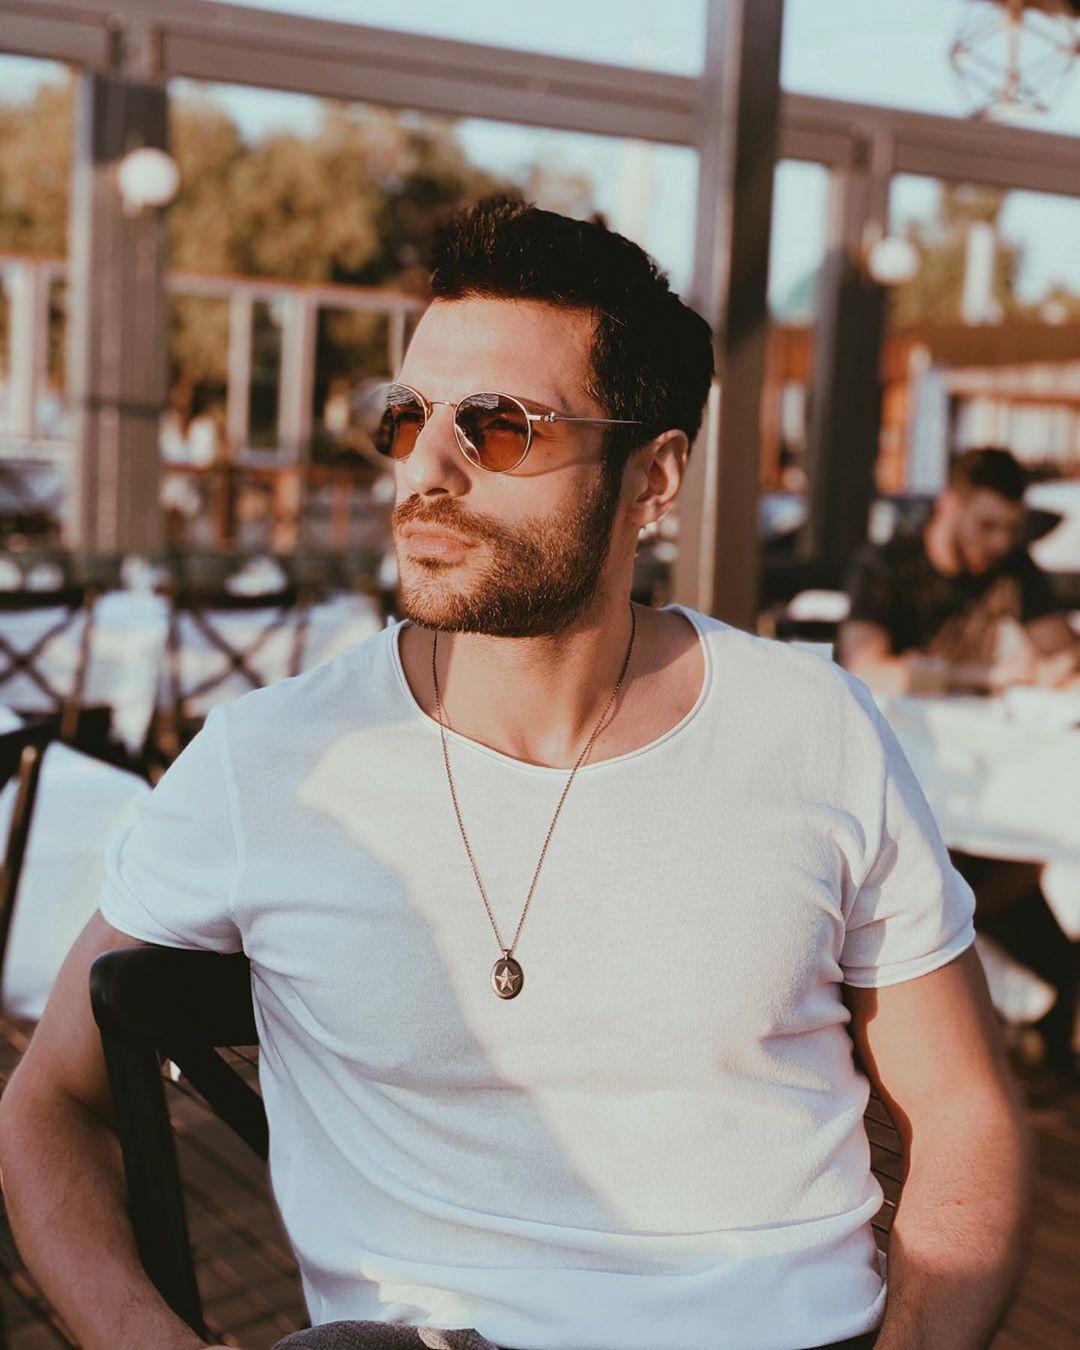 9 586 Me Gusta 280 Comentarios Serkan Cayoglu Serkancayoglu En Instagram In 2020 Turkish Actors Handsome Men Indian Designer Wear